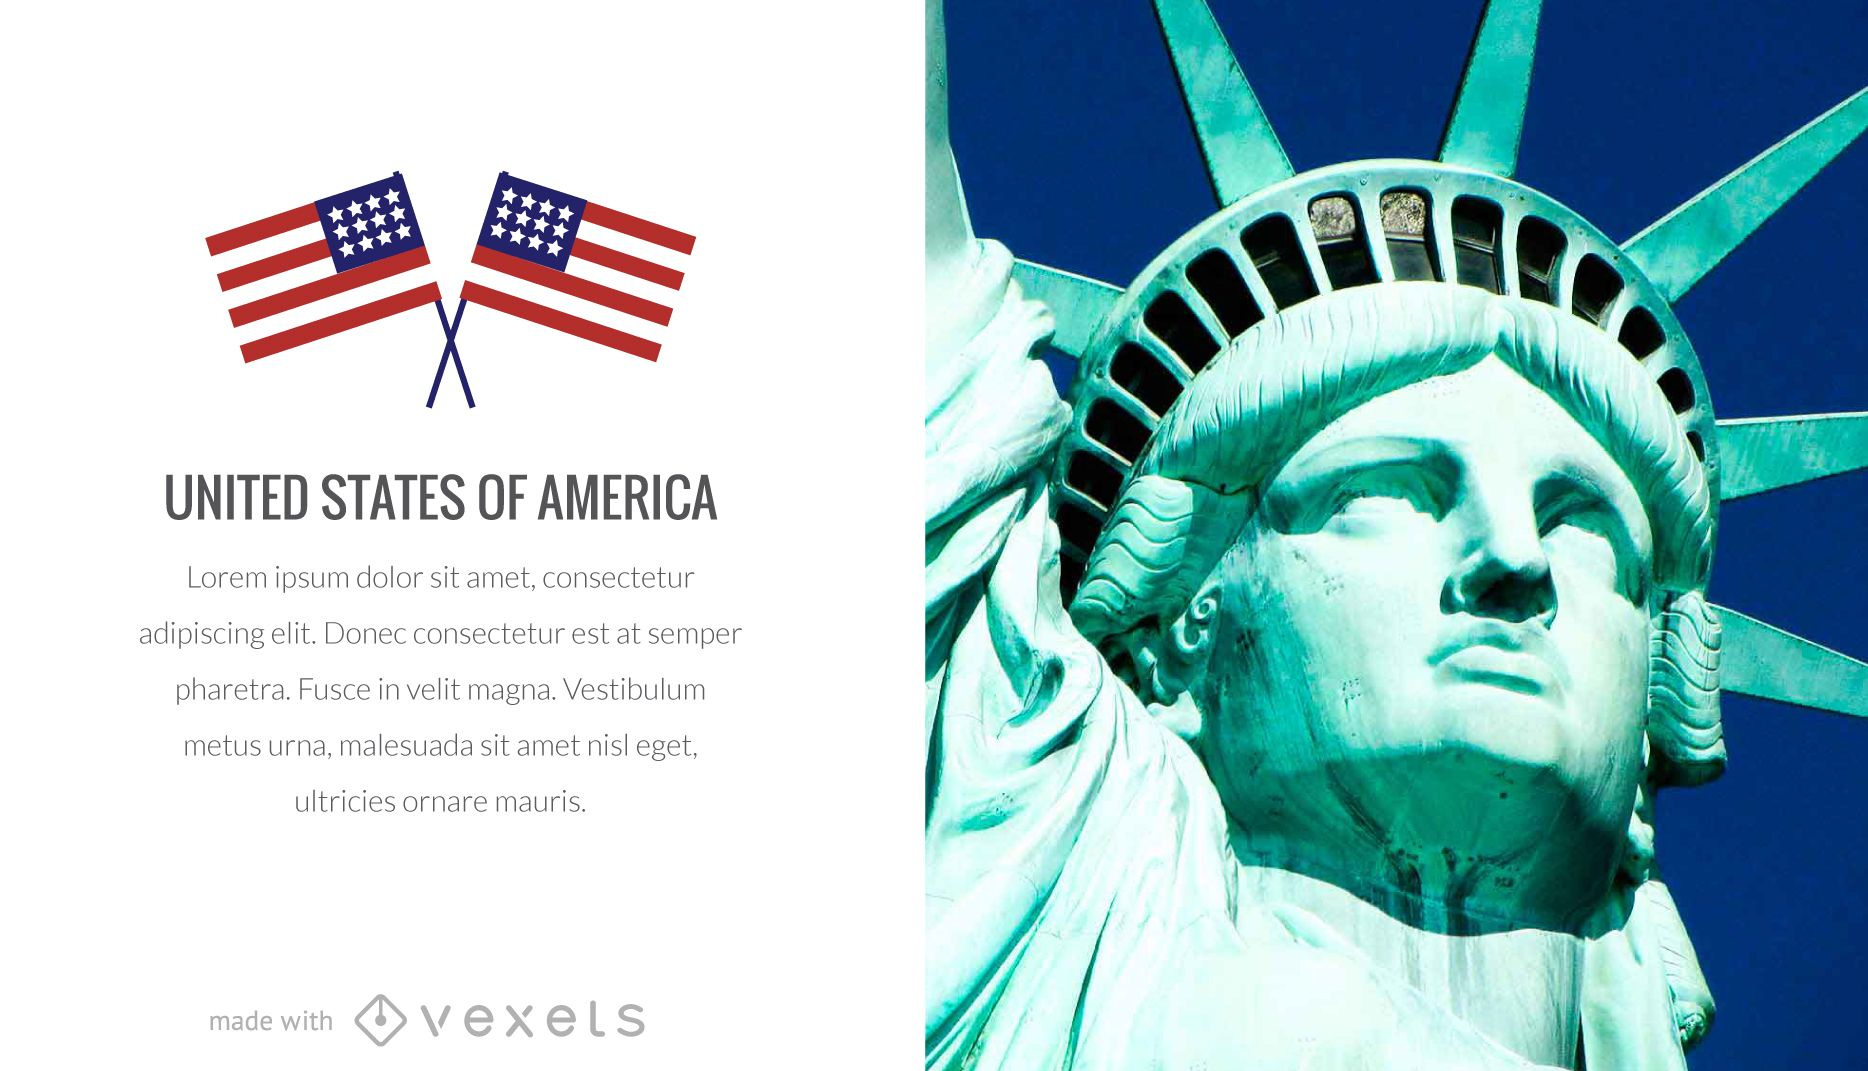 Patriotic United States poster maker